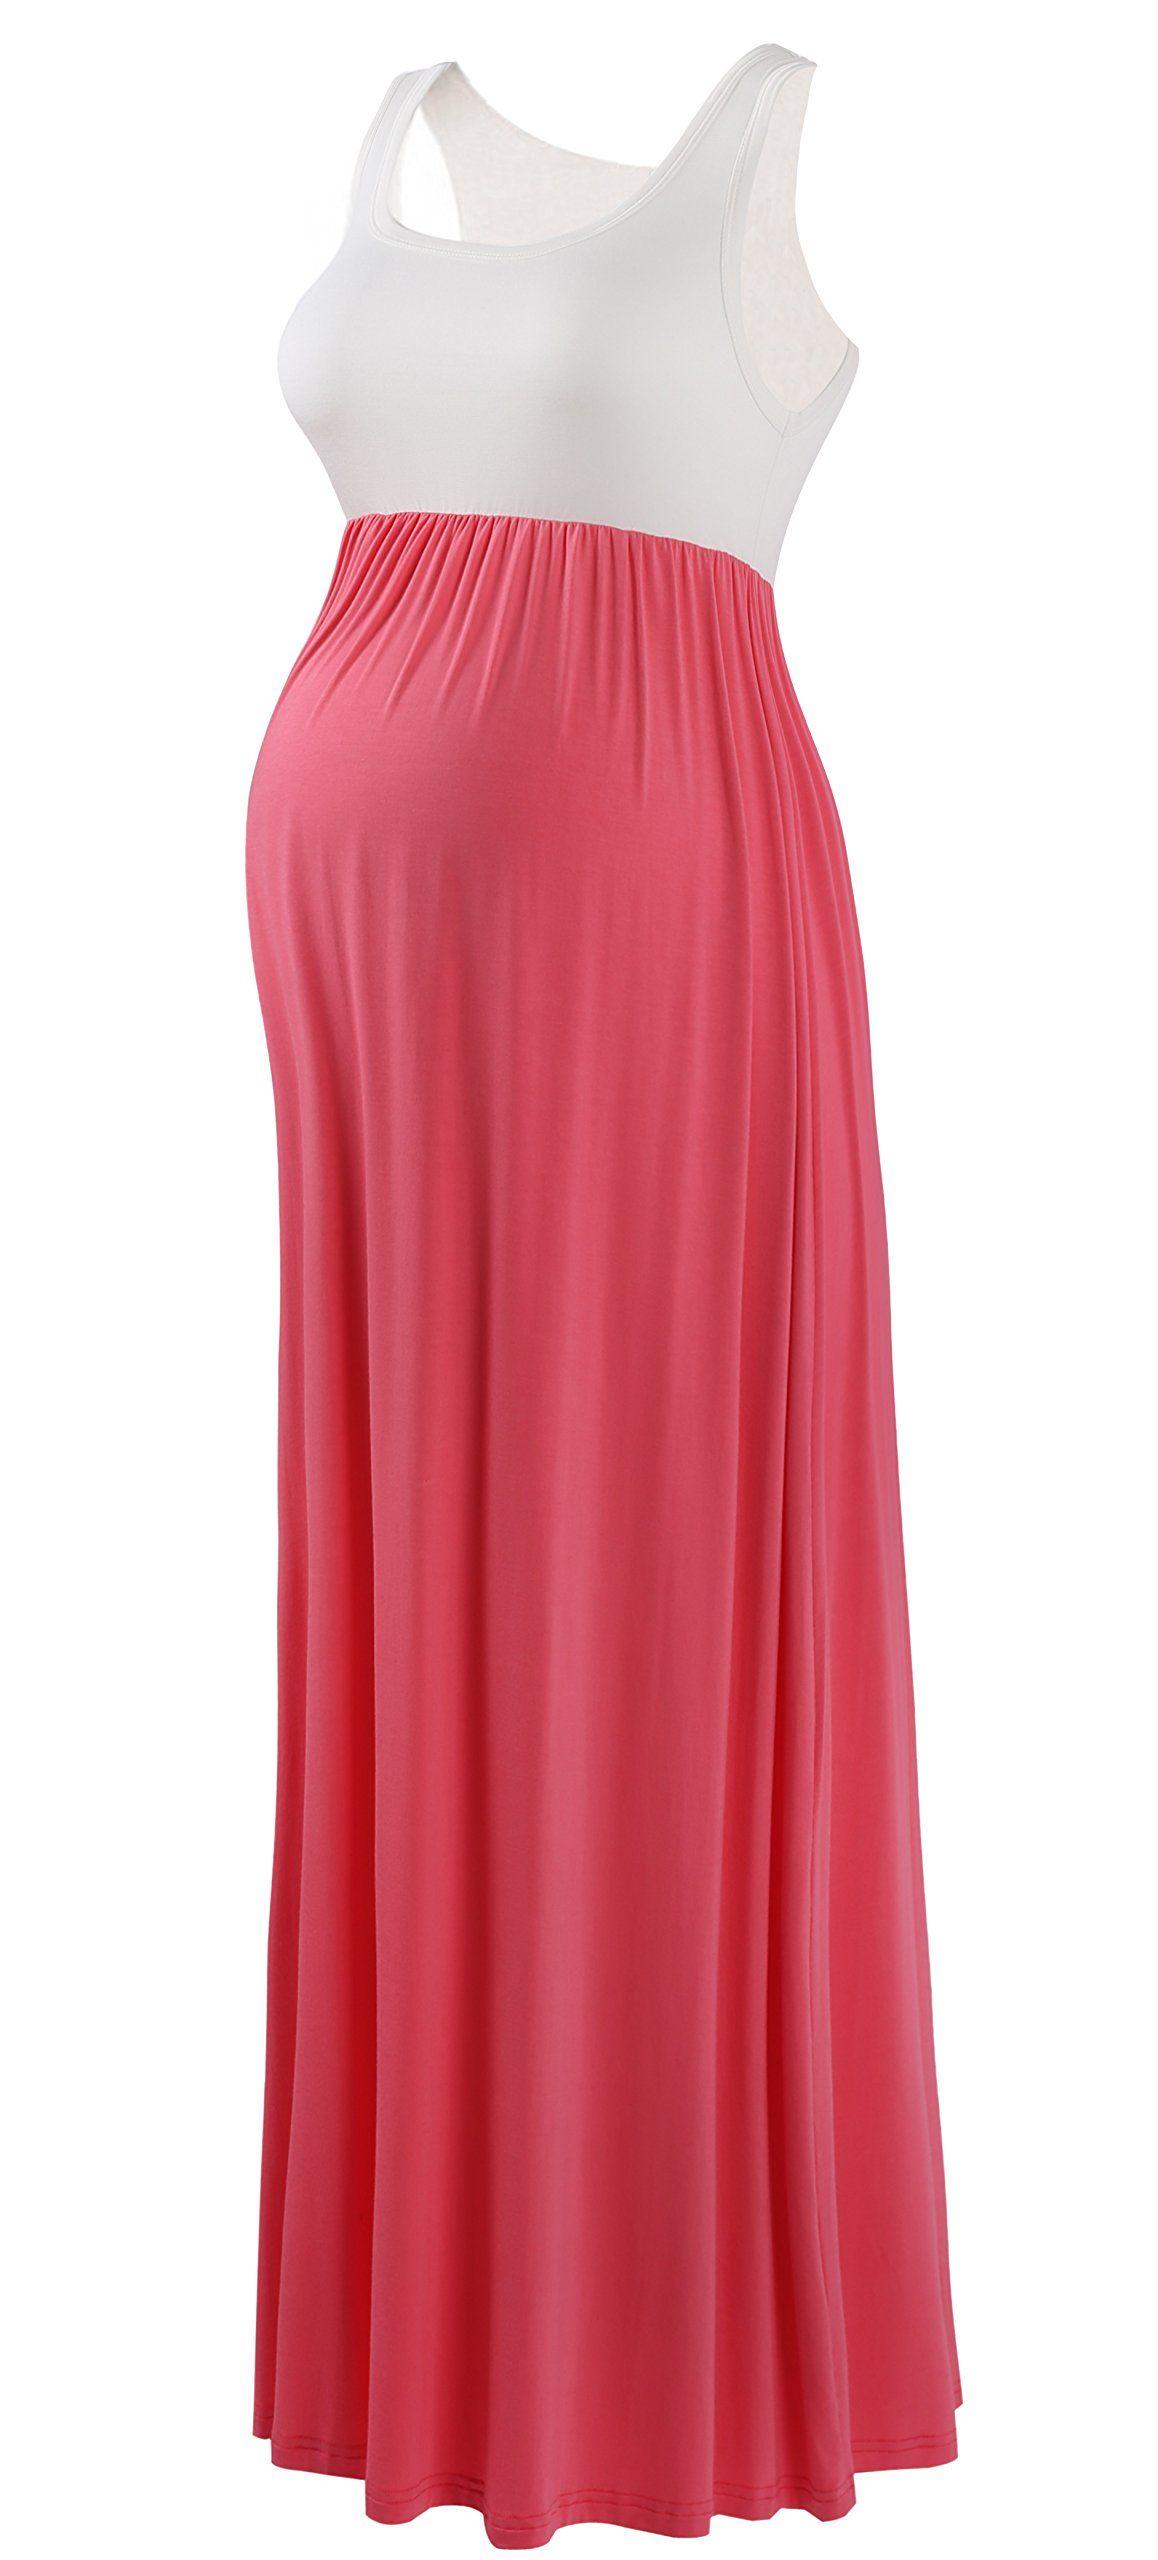 1d5fde2cbb1bc Maternity Fashion - baggy maternity maxi dress : Zinmore Maternity Dress  Pregnancy Maternity Skirt Contrast Maxi Tank Dress XLarge White/Coral ***  Want ...